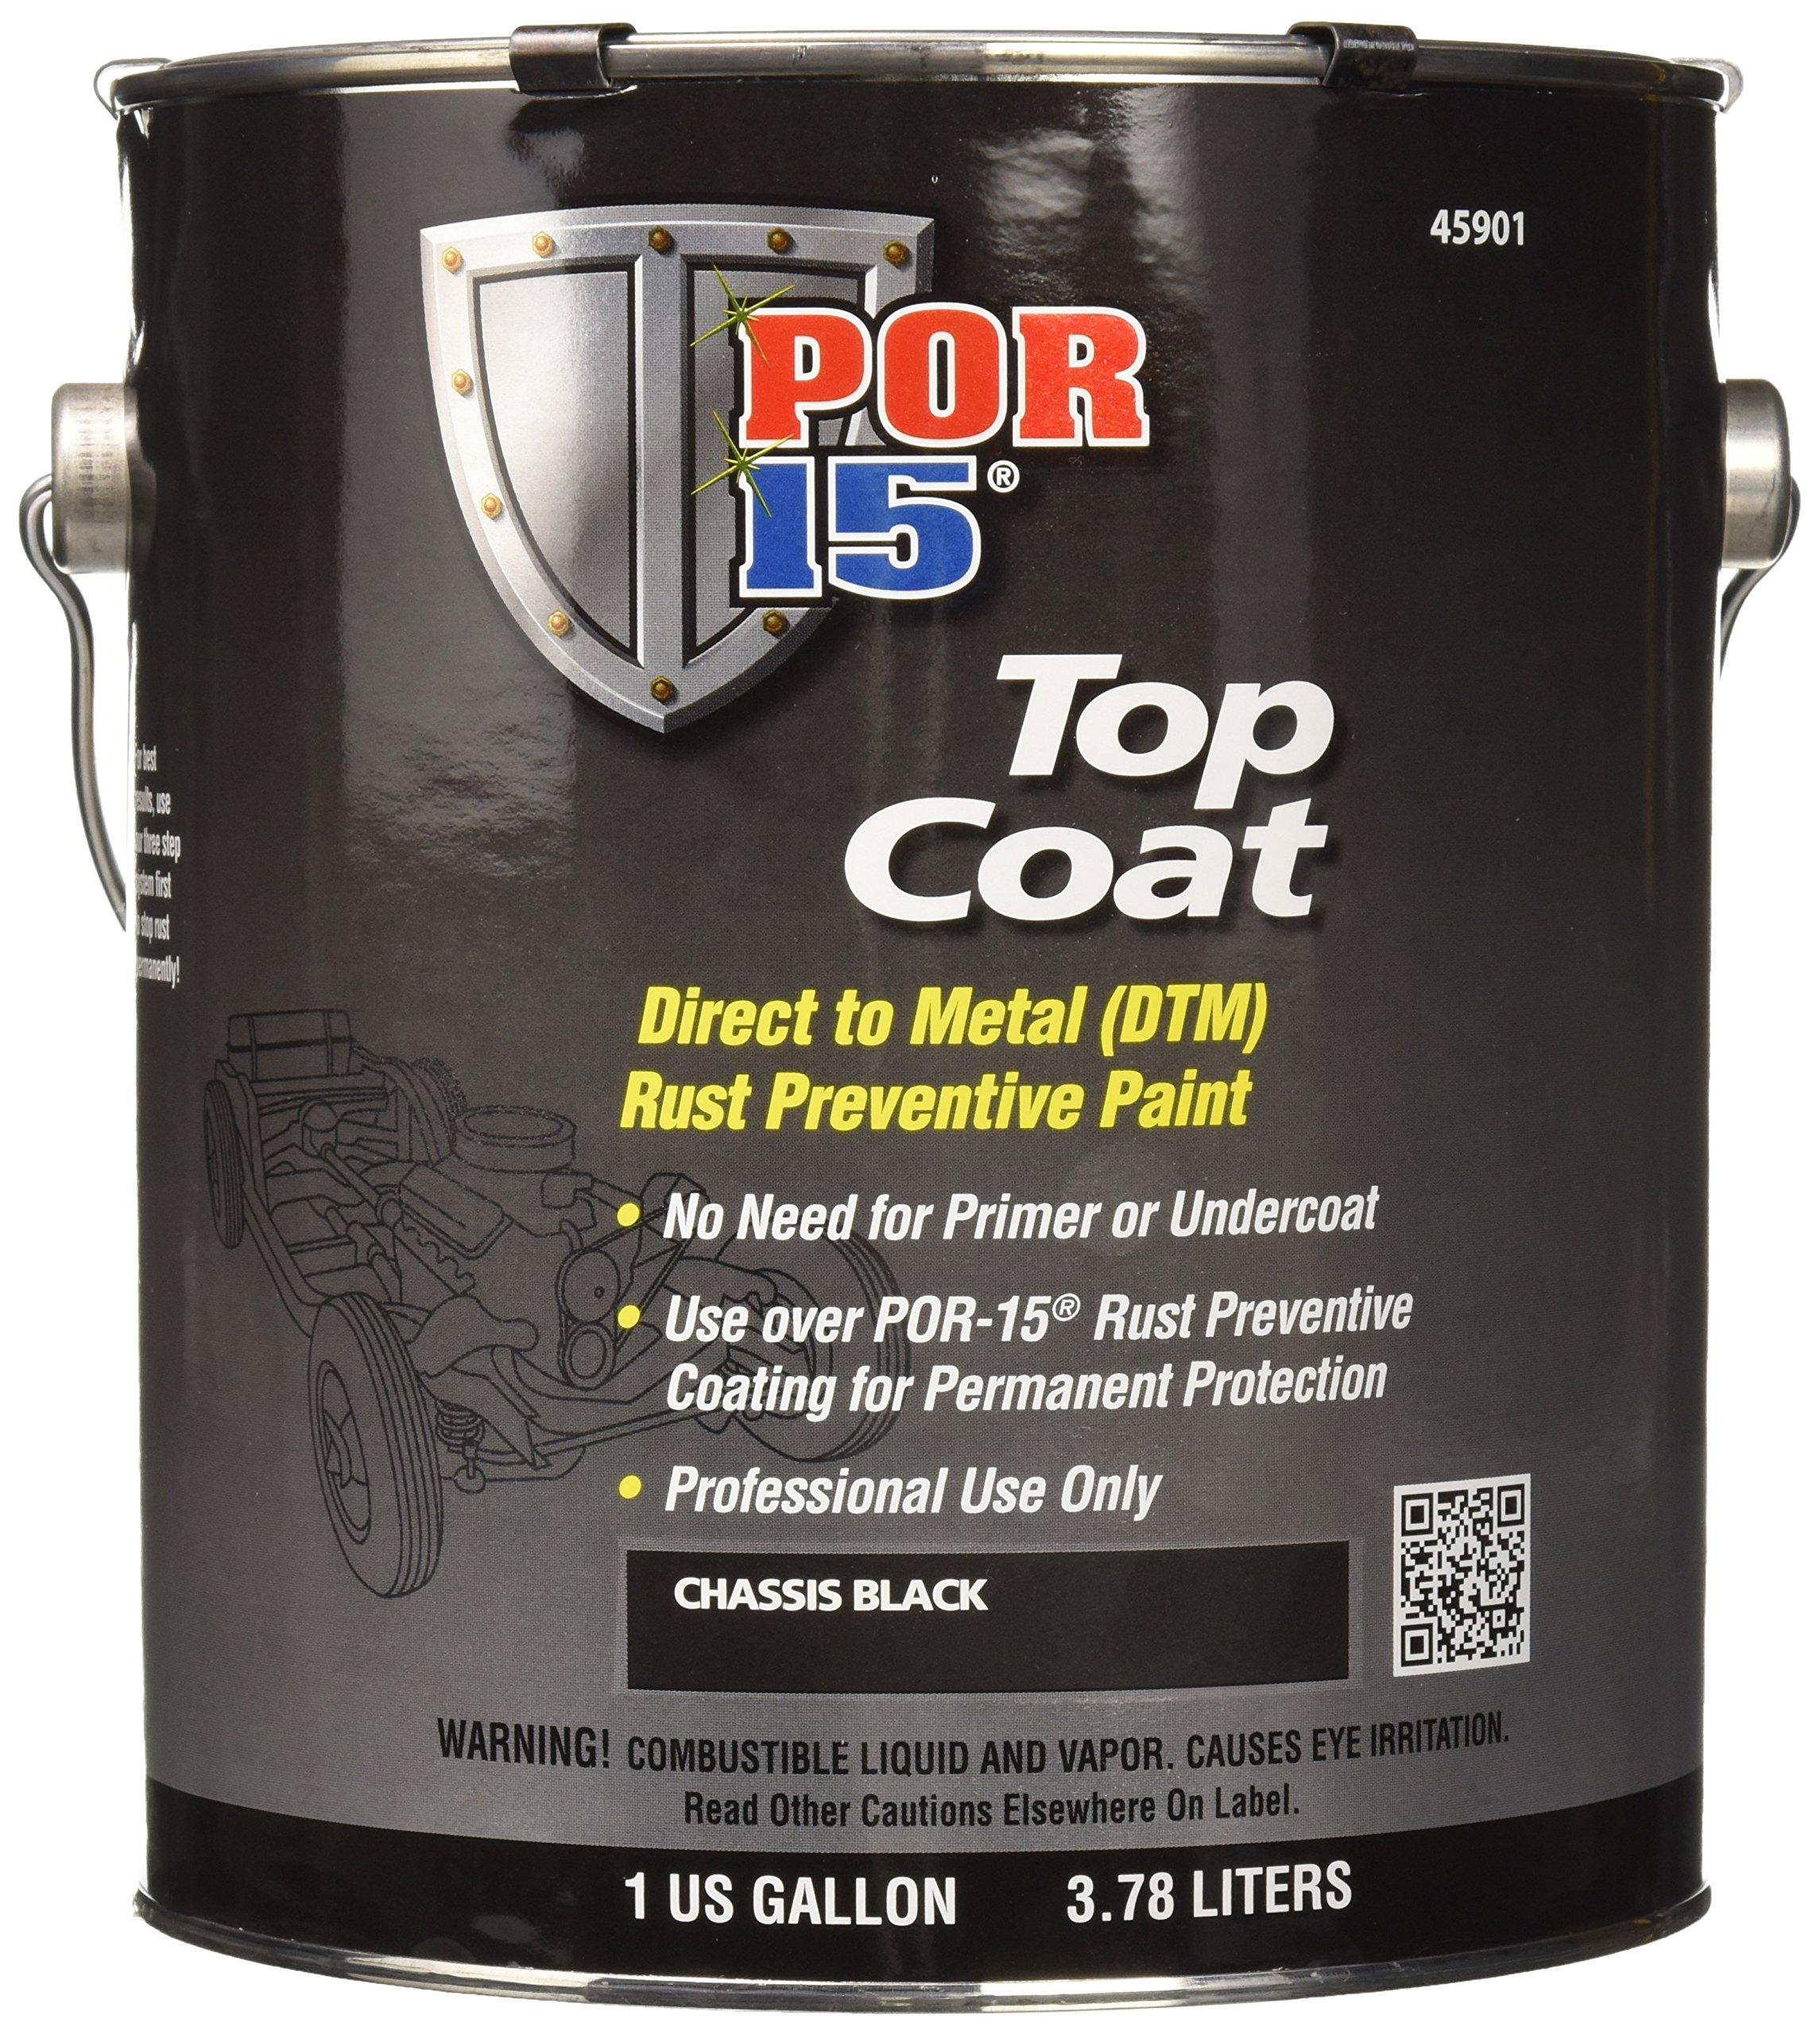 POR-15 45901 Chassis Black Top Coat - 1 gal by POR-15